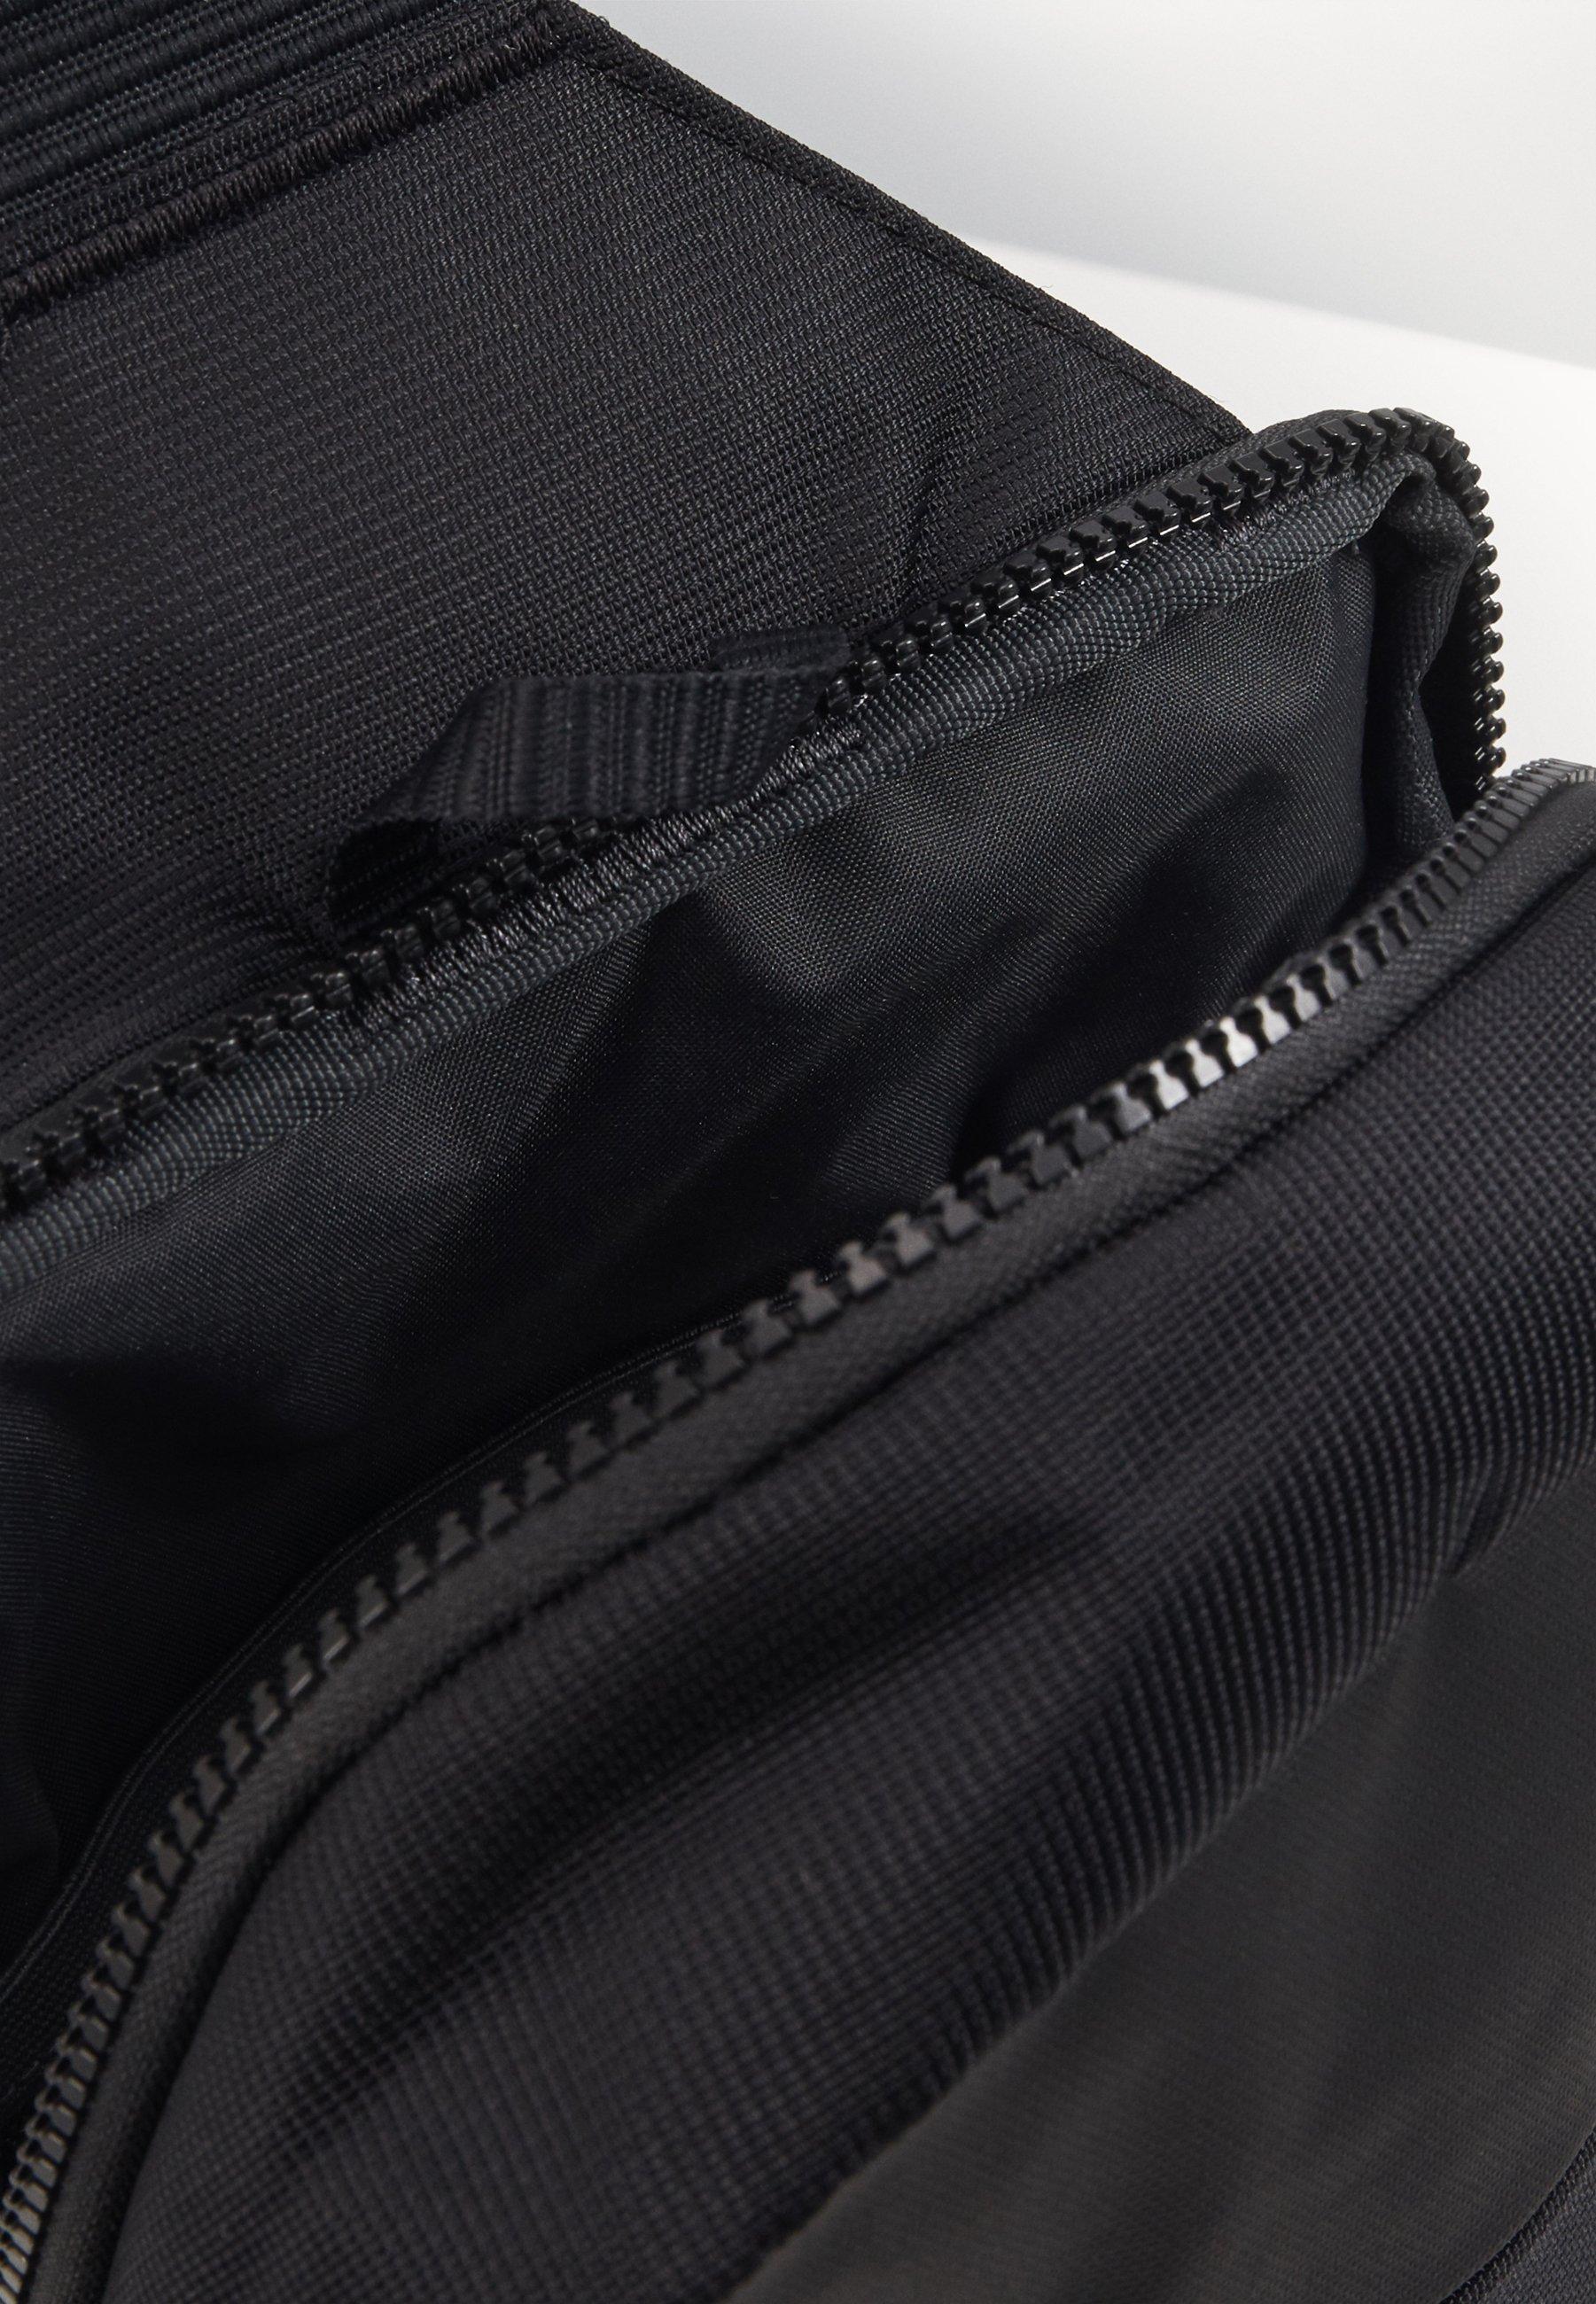 Nike Sportswear NIKE SPORTSWEAR ESSENTIALS HÜFTTASCHE - Skulderveske - black/dark smoke grey/svart 6eEZQIdOkES3sGD